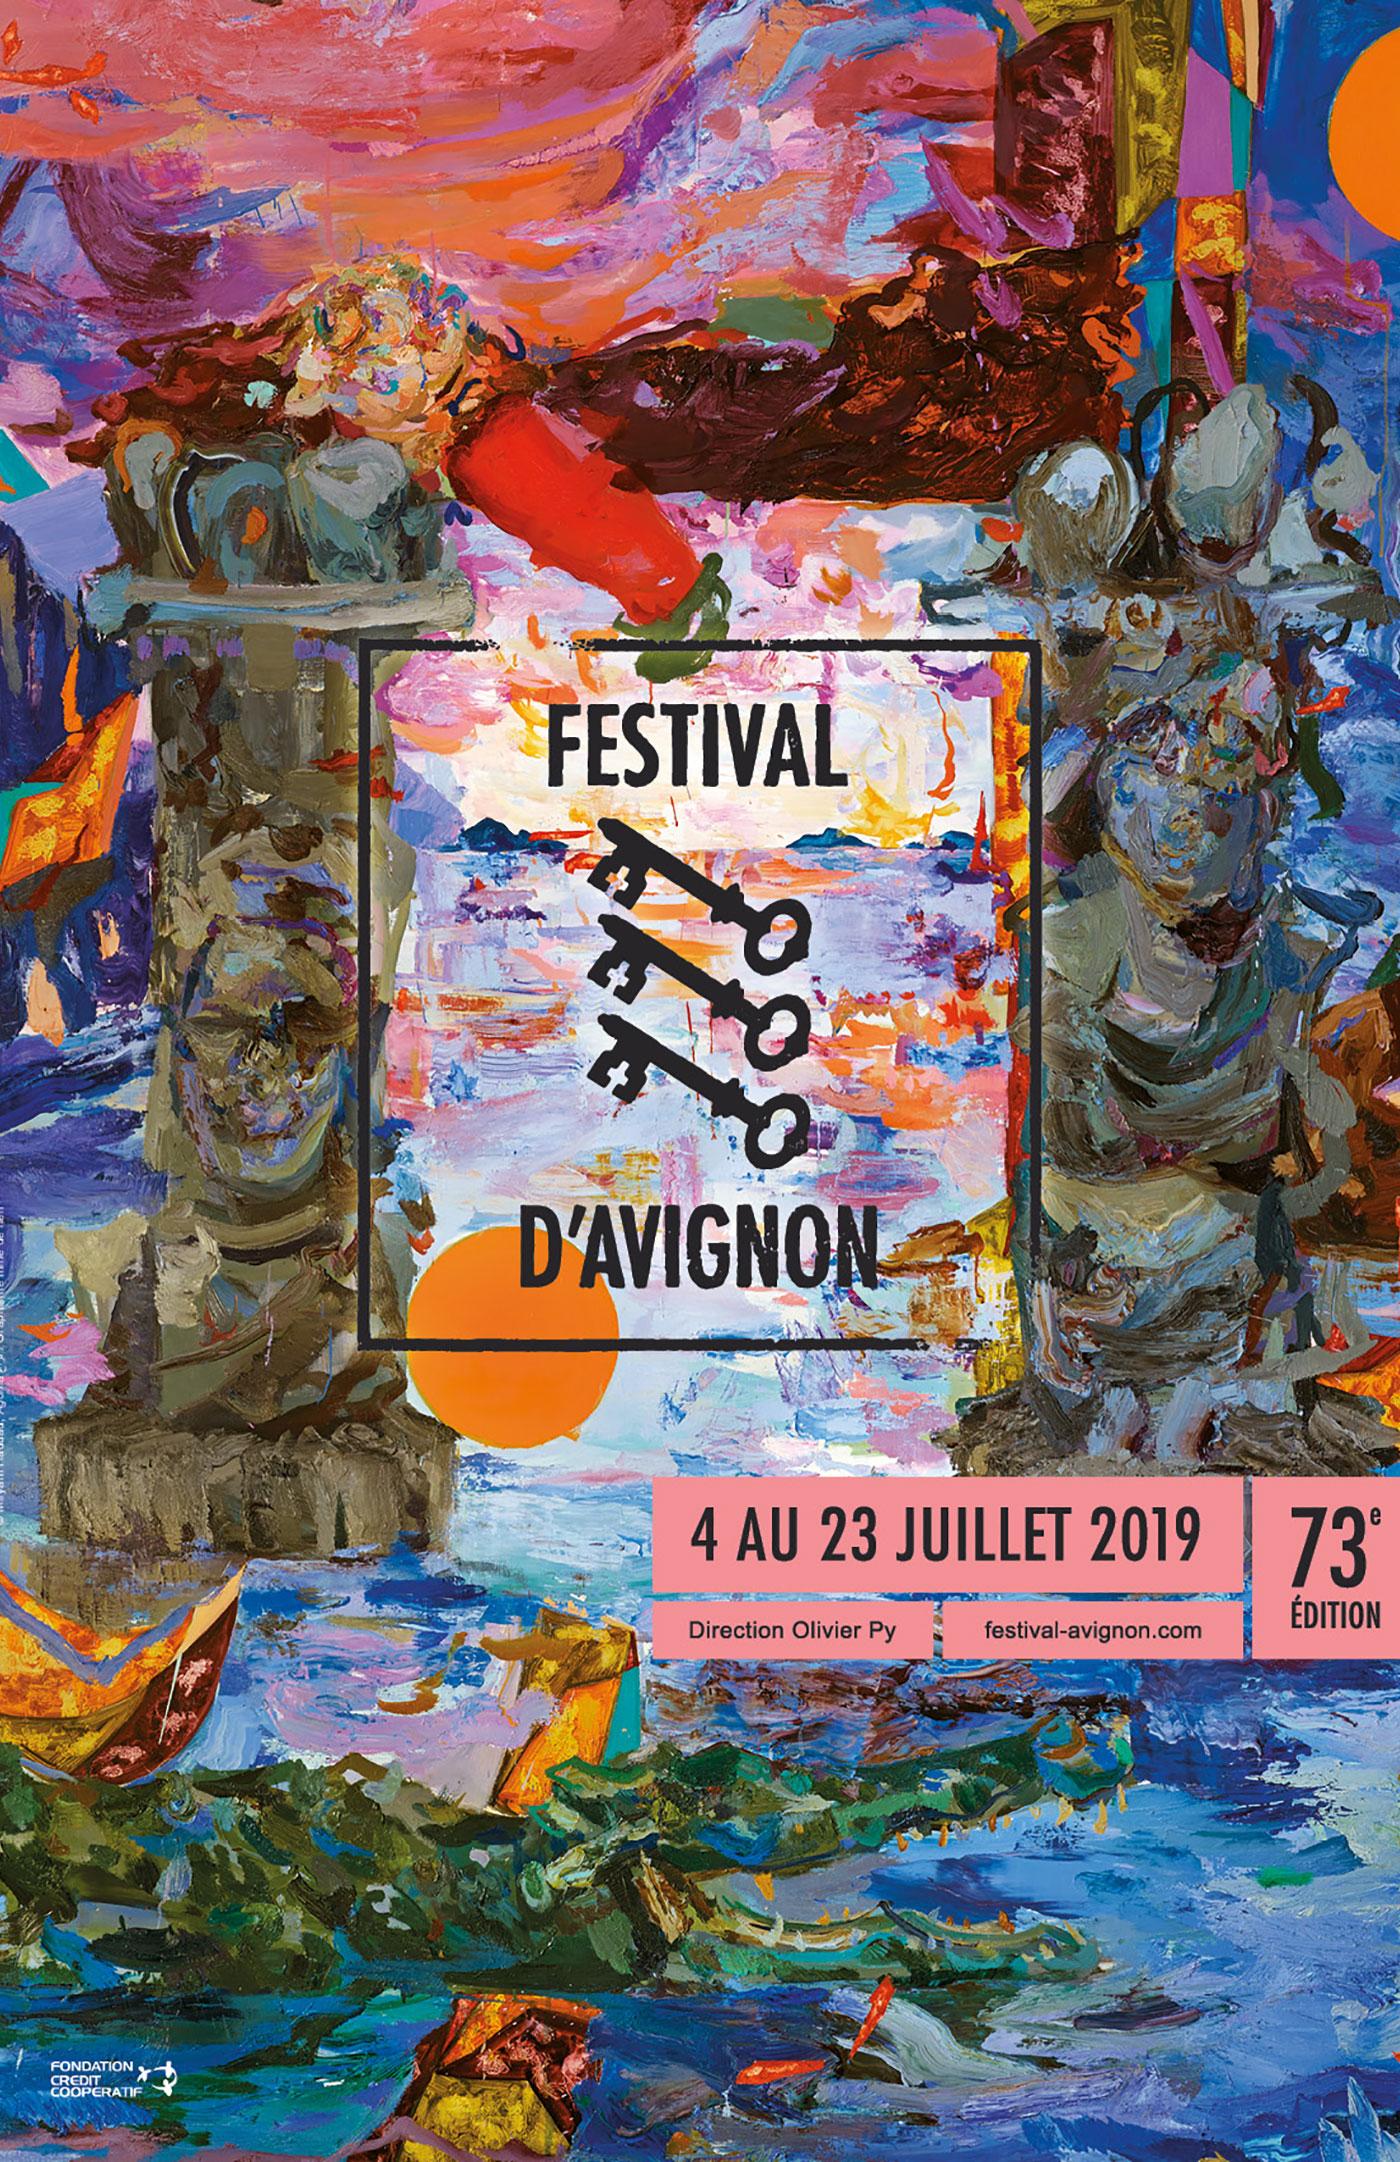 rencontres professionnelles festival davignon 2019)